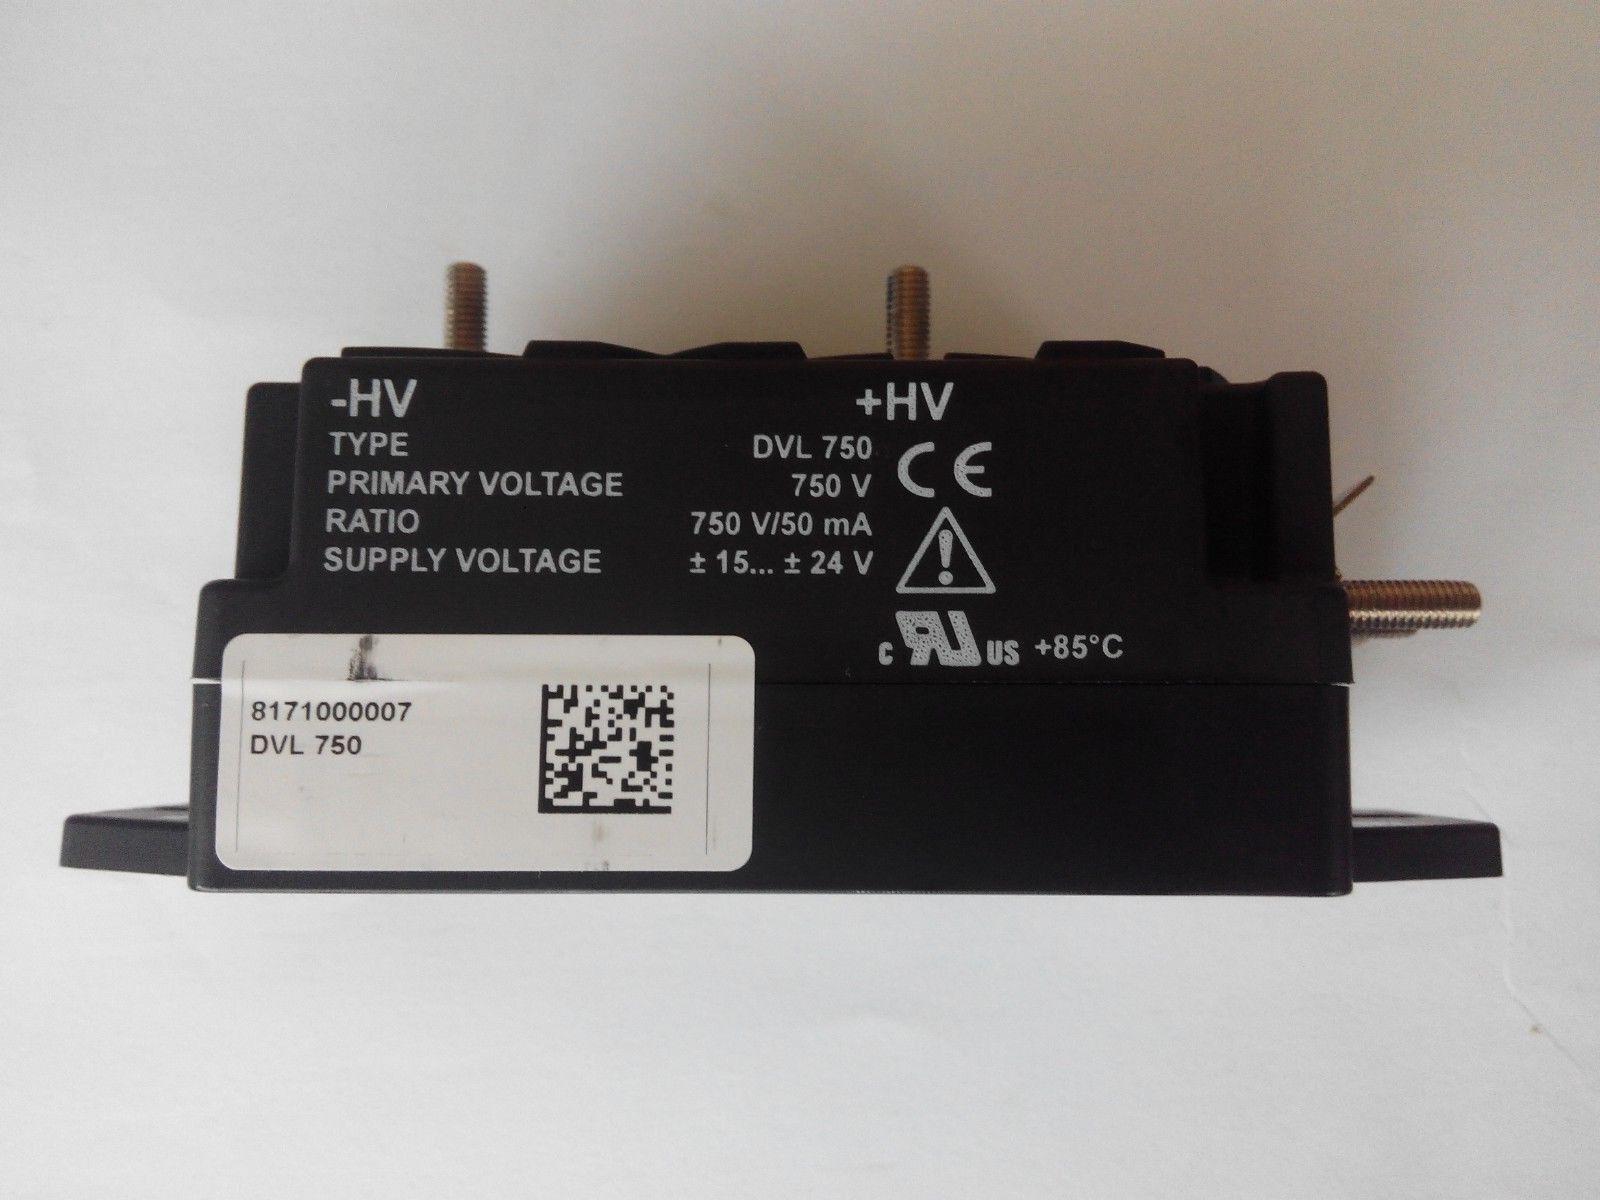 Corriente de aislamiento LEM DVL 750 750 750 electrónico transductor 76d95b